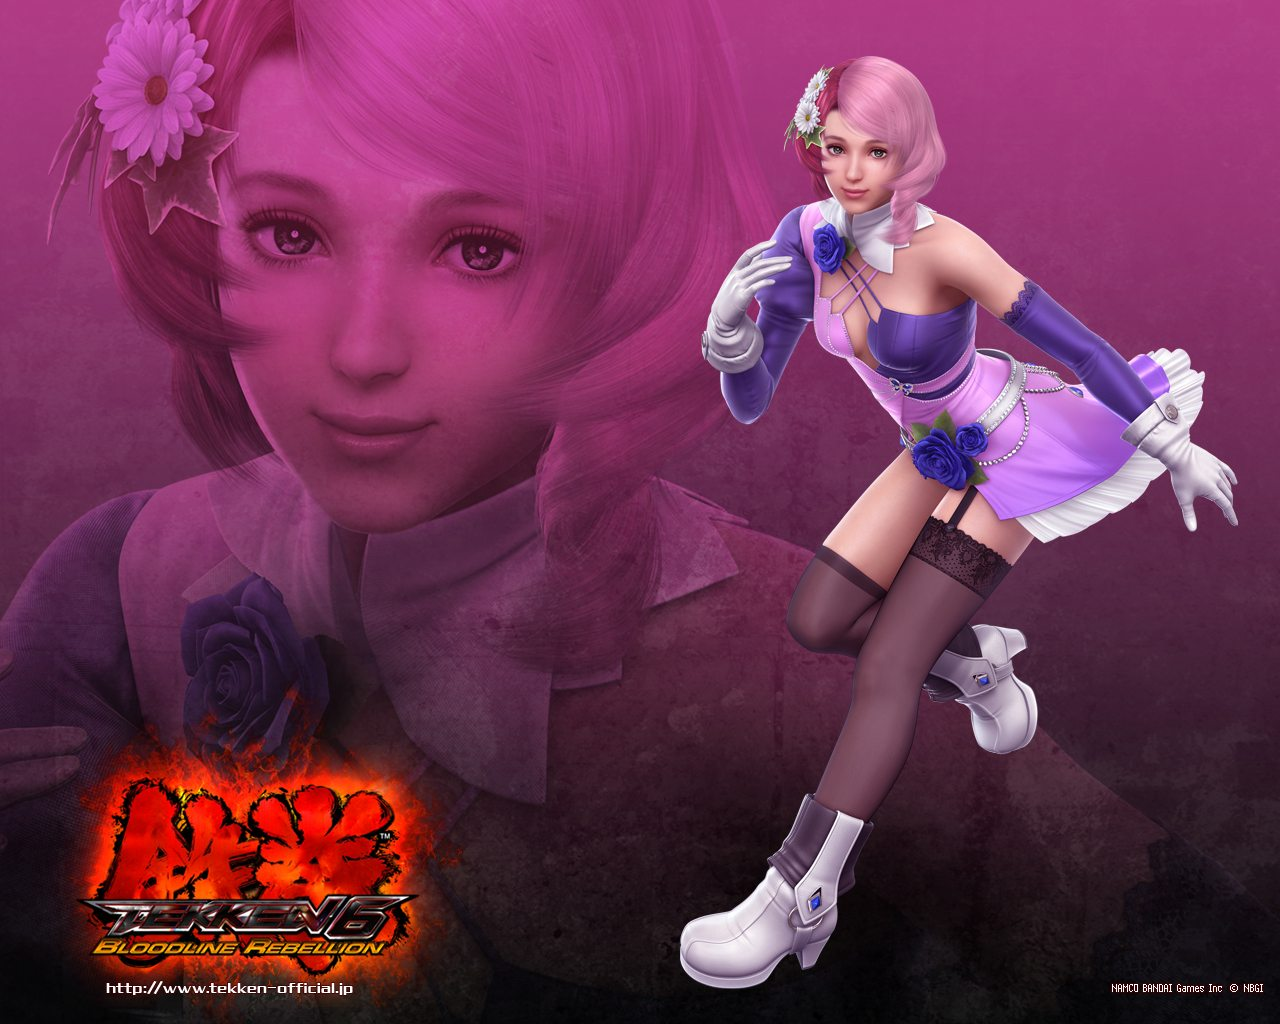 Alisa   Tekken 6 Wallpaper Gamebud 1280x1024